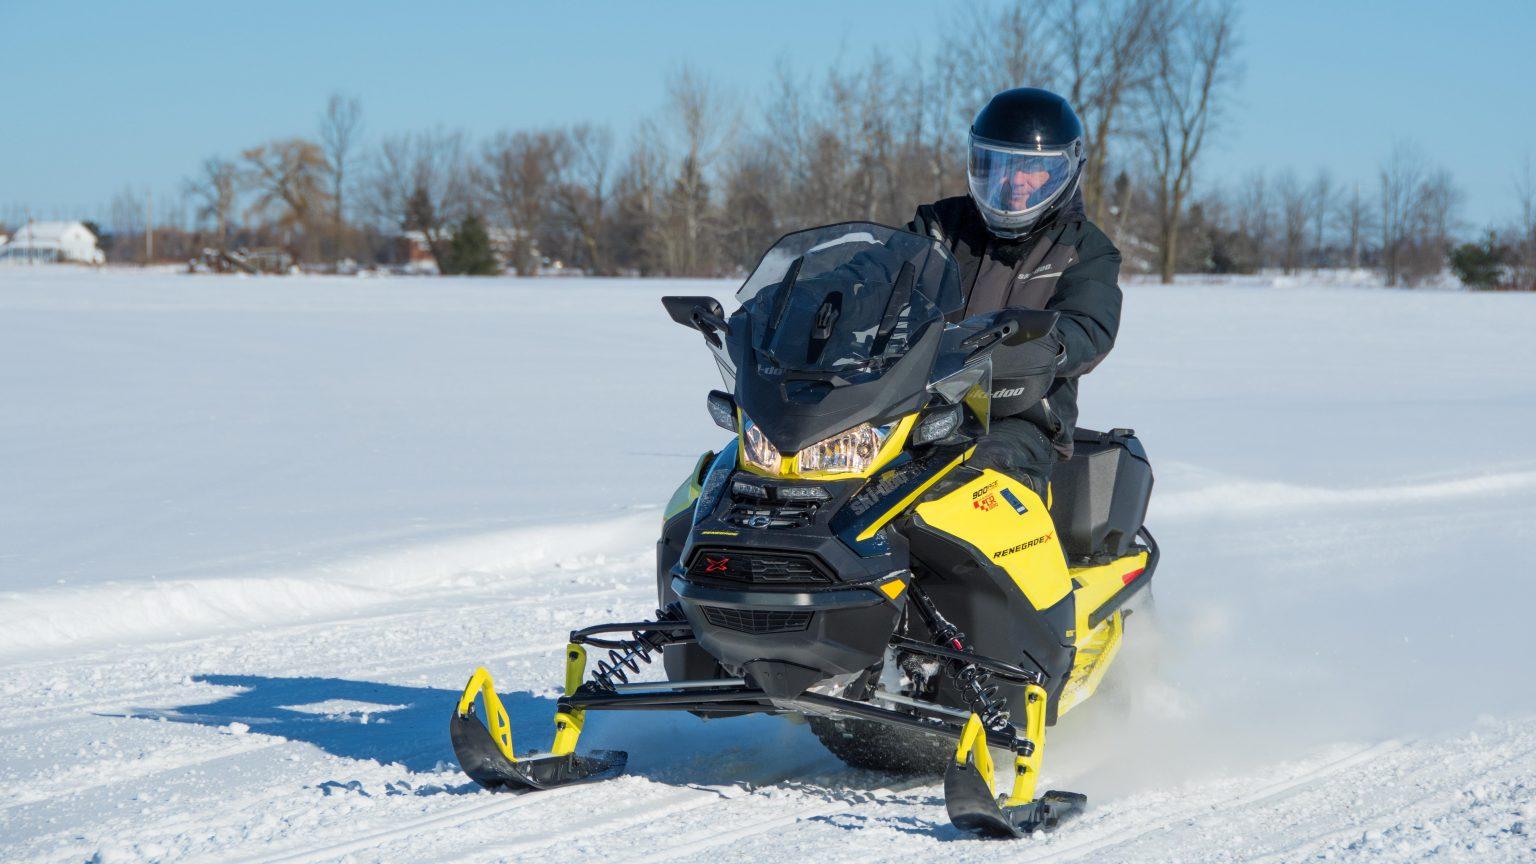 Ski-Doo Renegade X 900 ACE Turbo 2021 – Premières Impressions